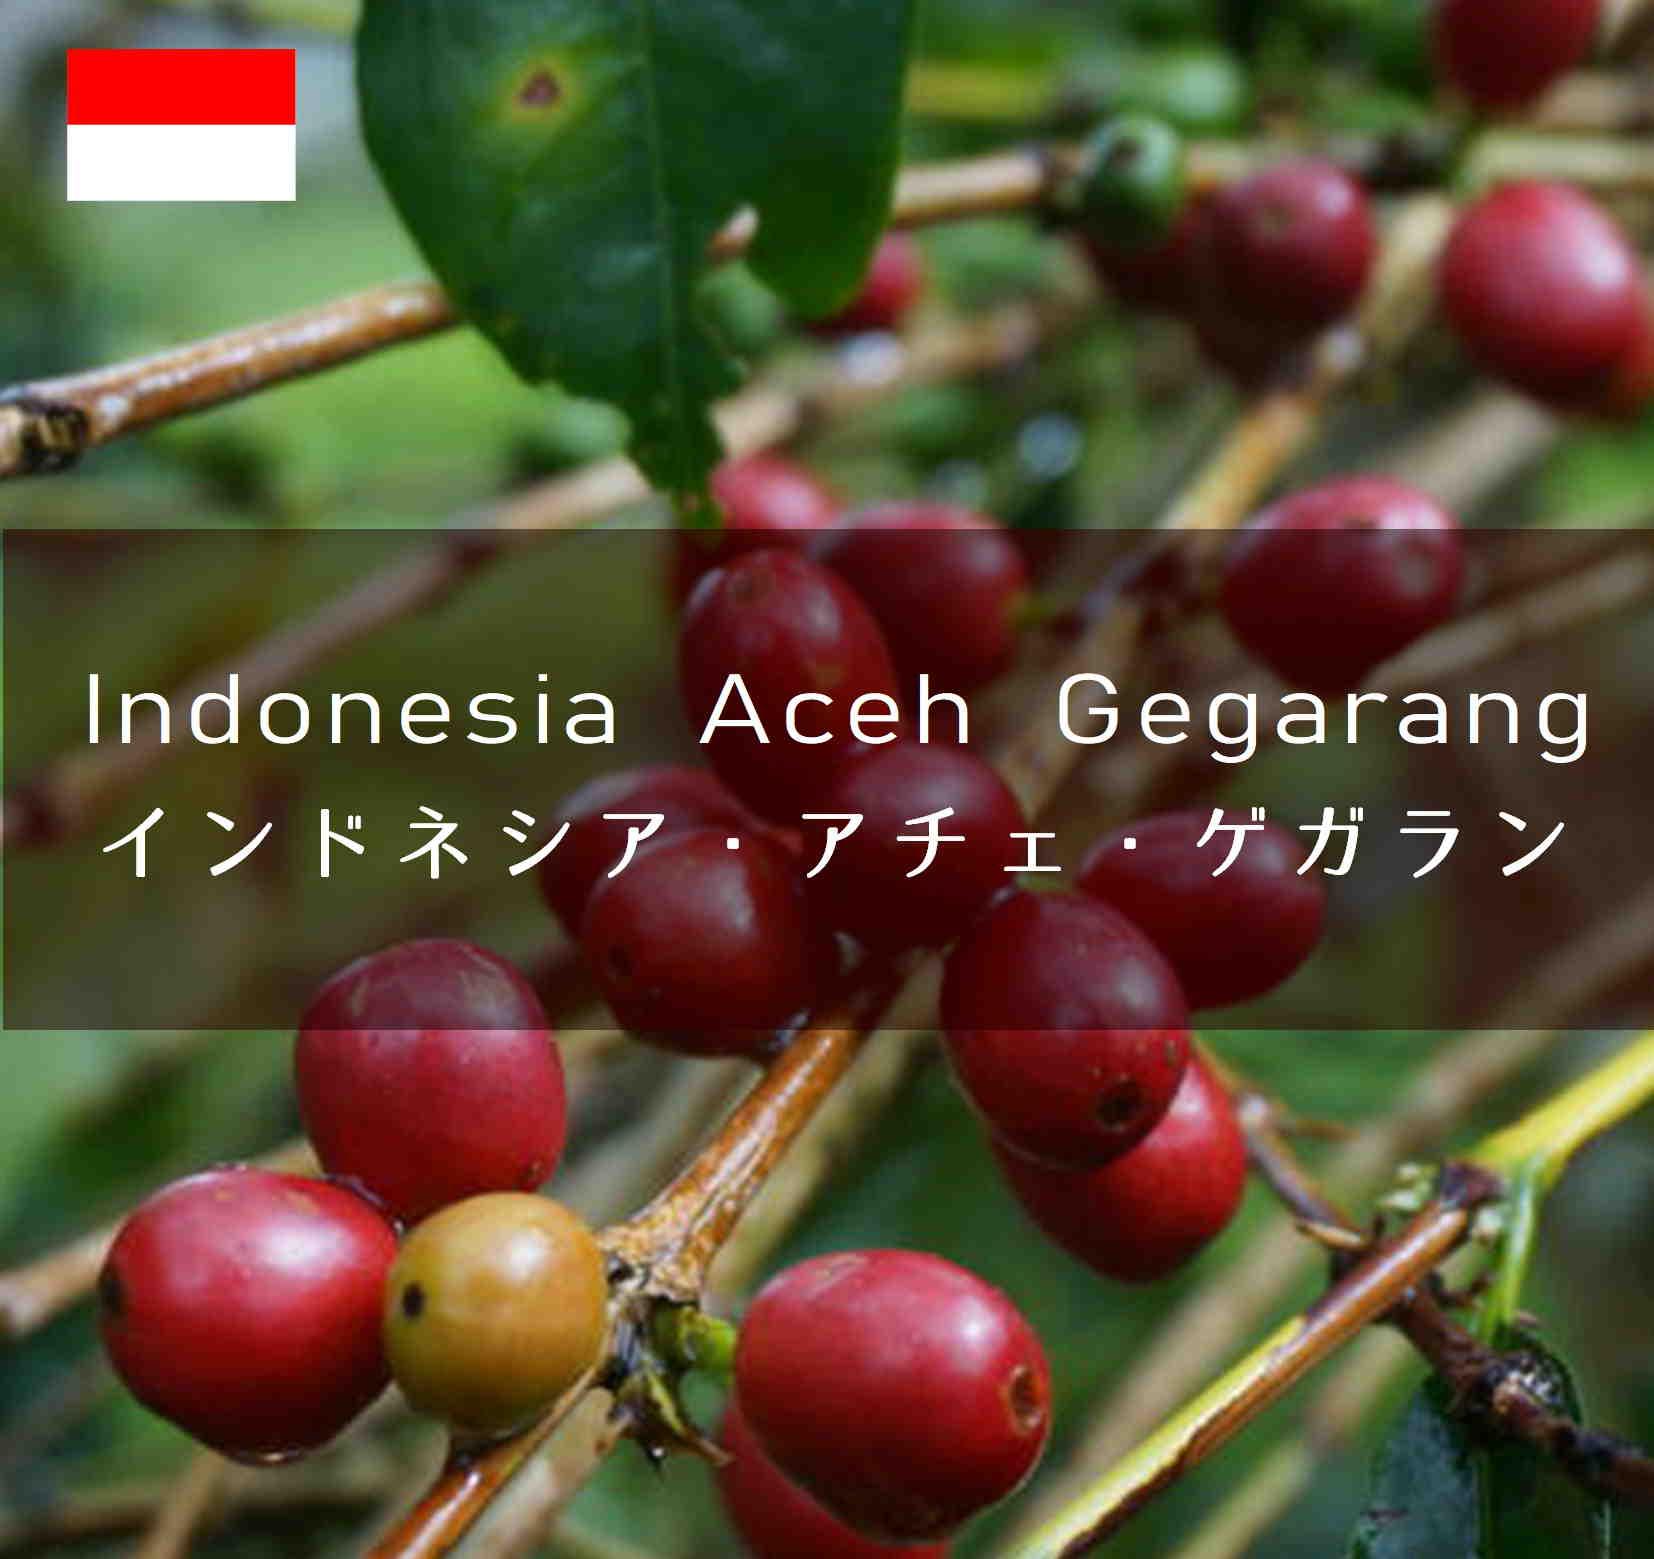 AcehGegarang